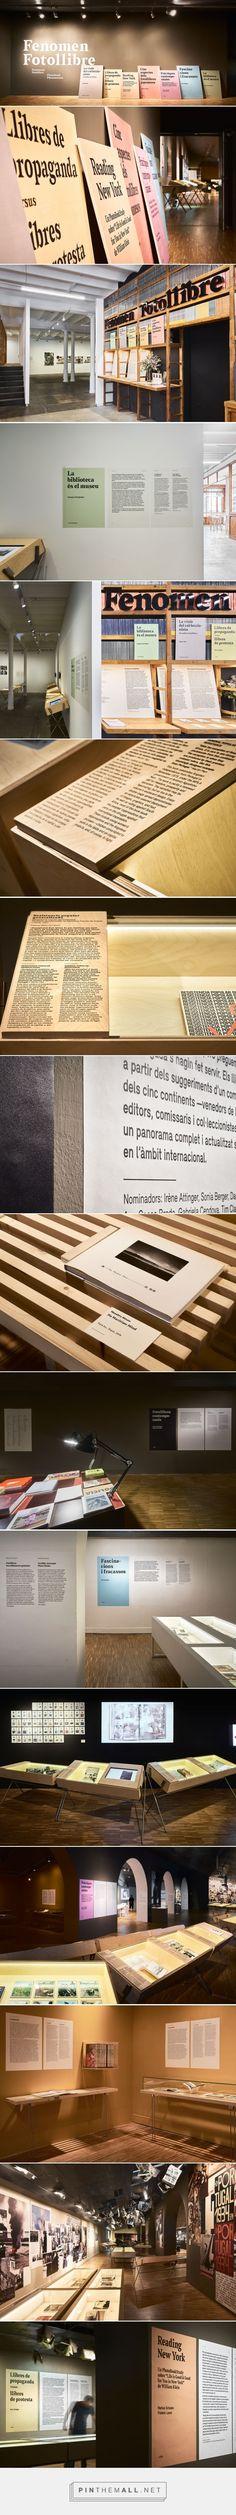 zapata y herras lawyers fice small interior design firms nyc Exposició Fenomen Fotollibre - CCCB